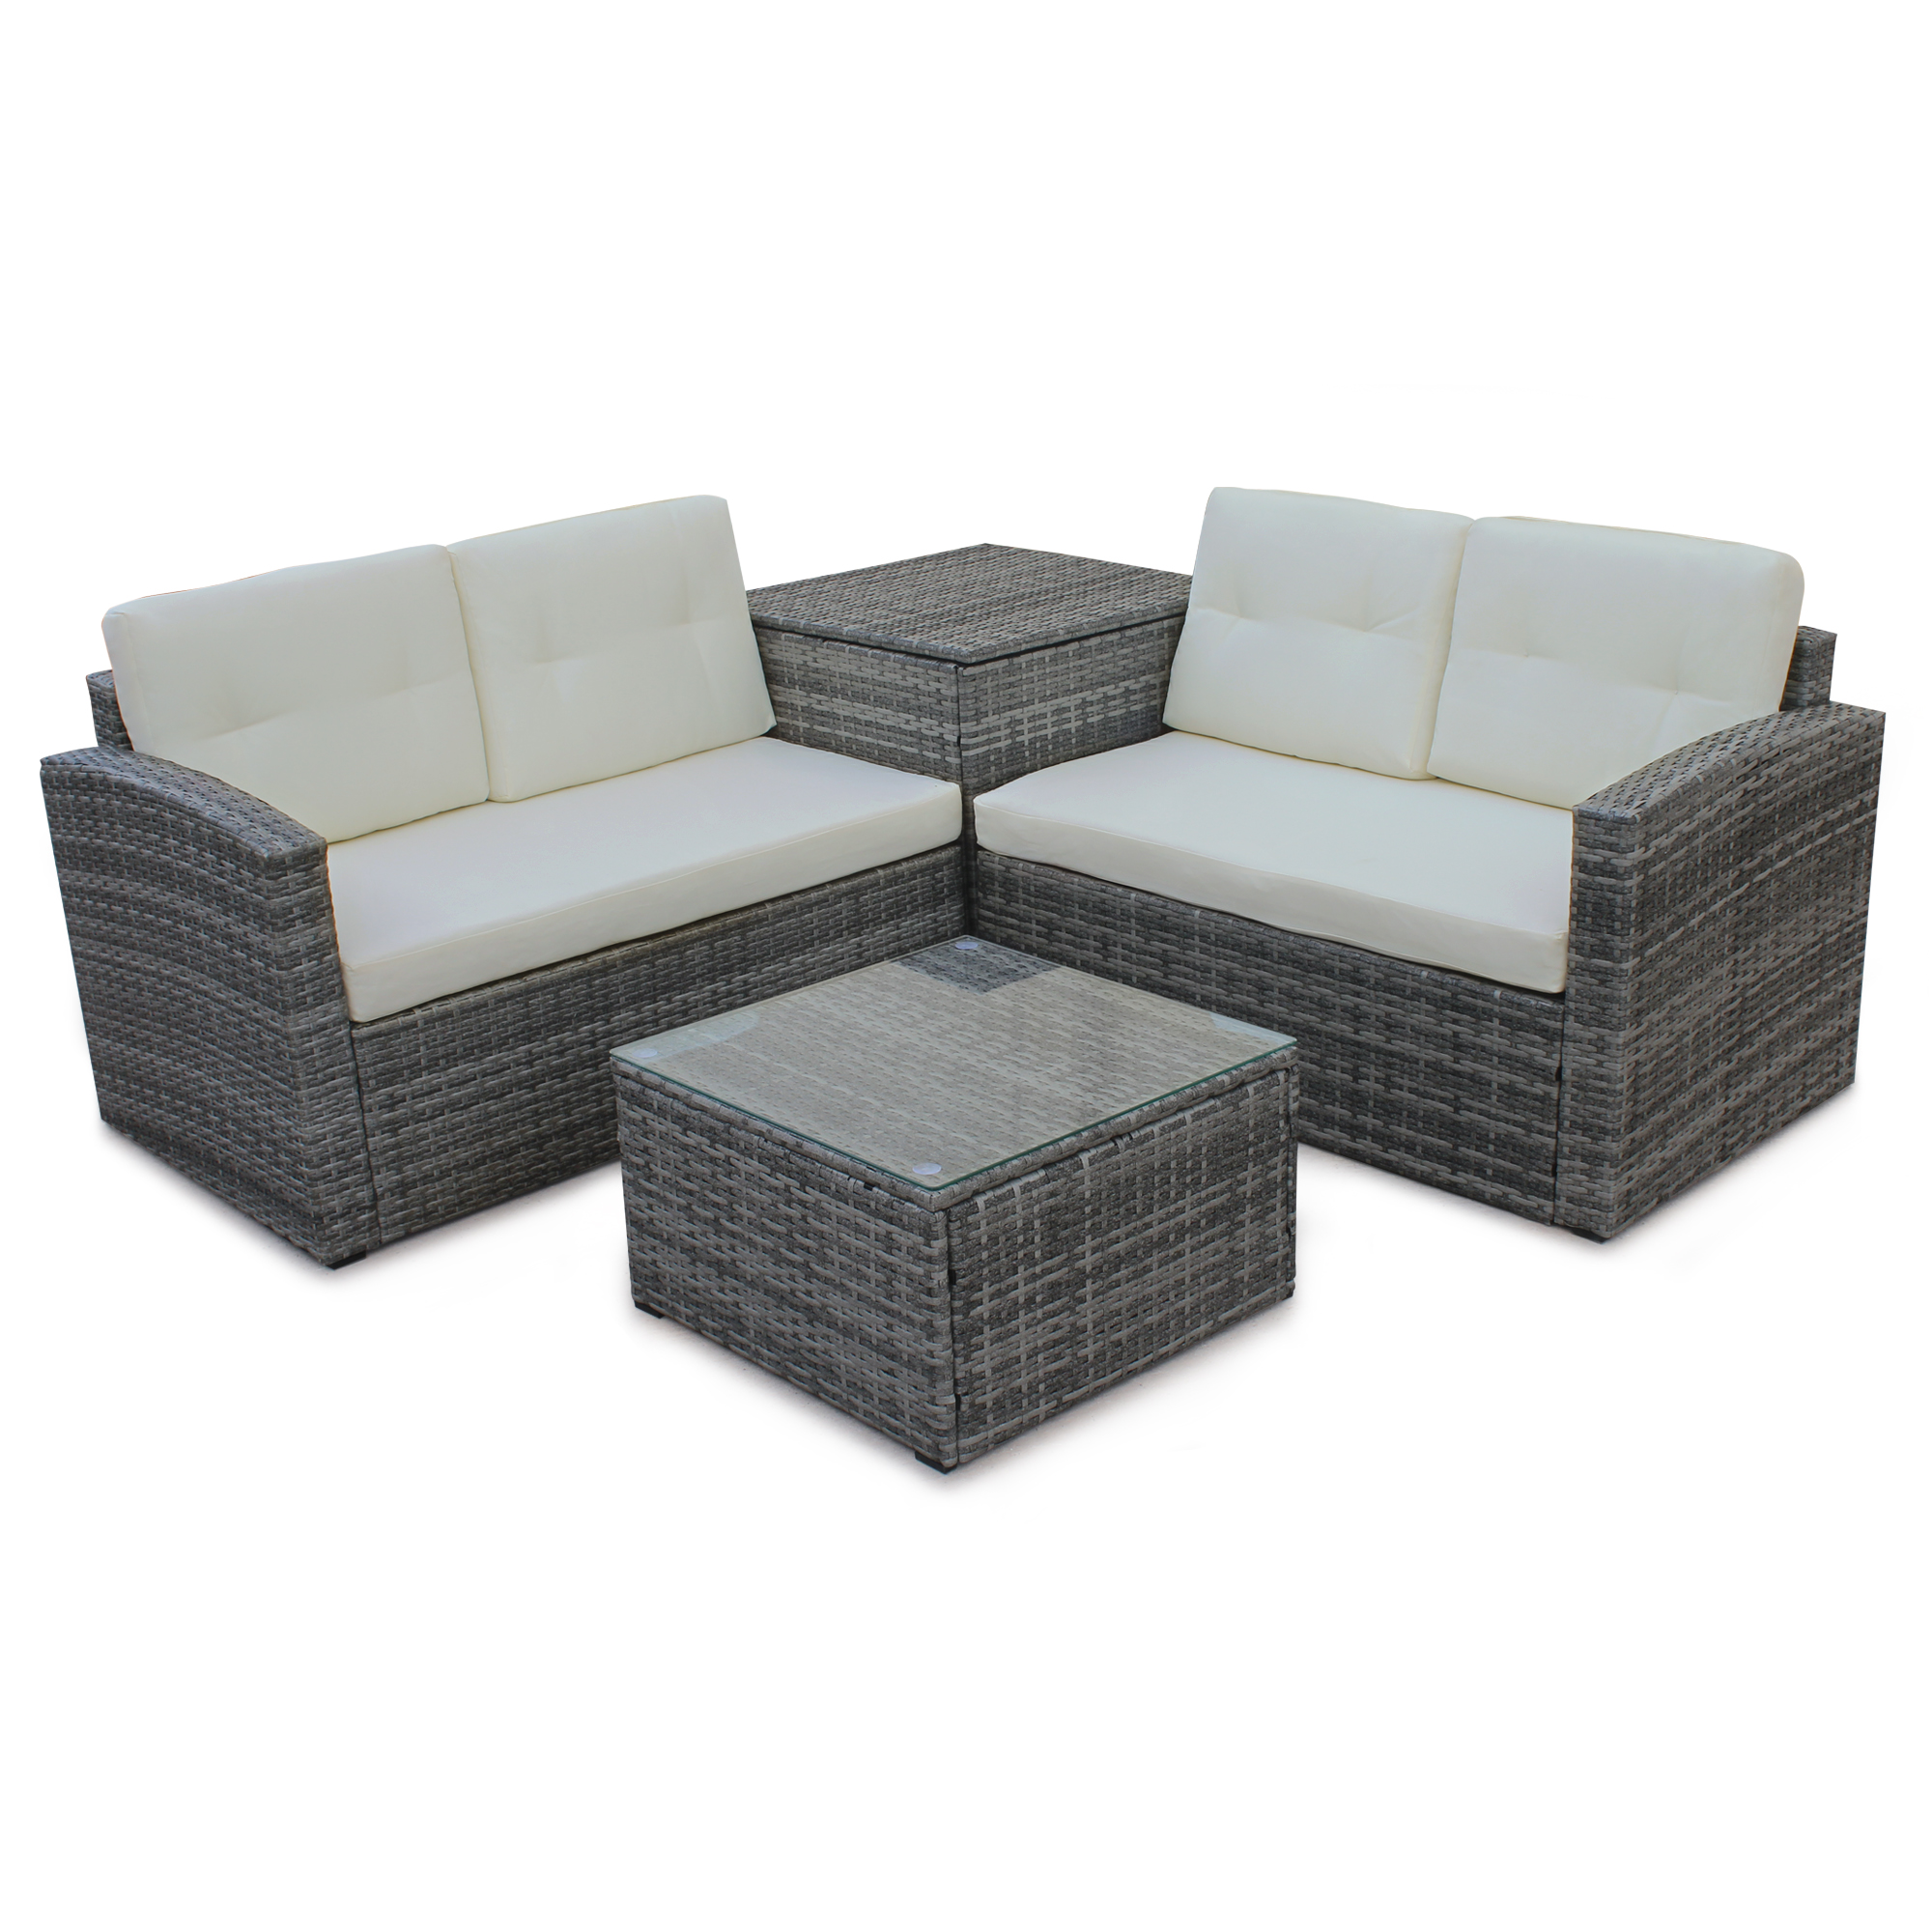 Patio Sofa With Storage: TKOOFN 4PCS Patio Rattan Wicker Furniture Set Sofa